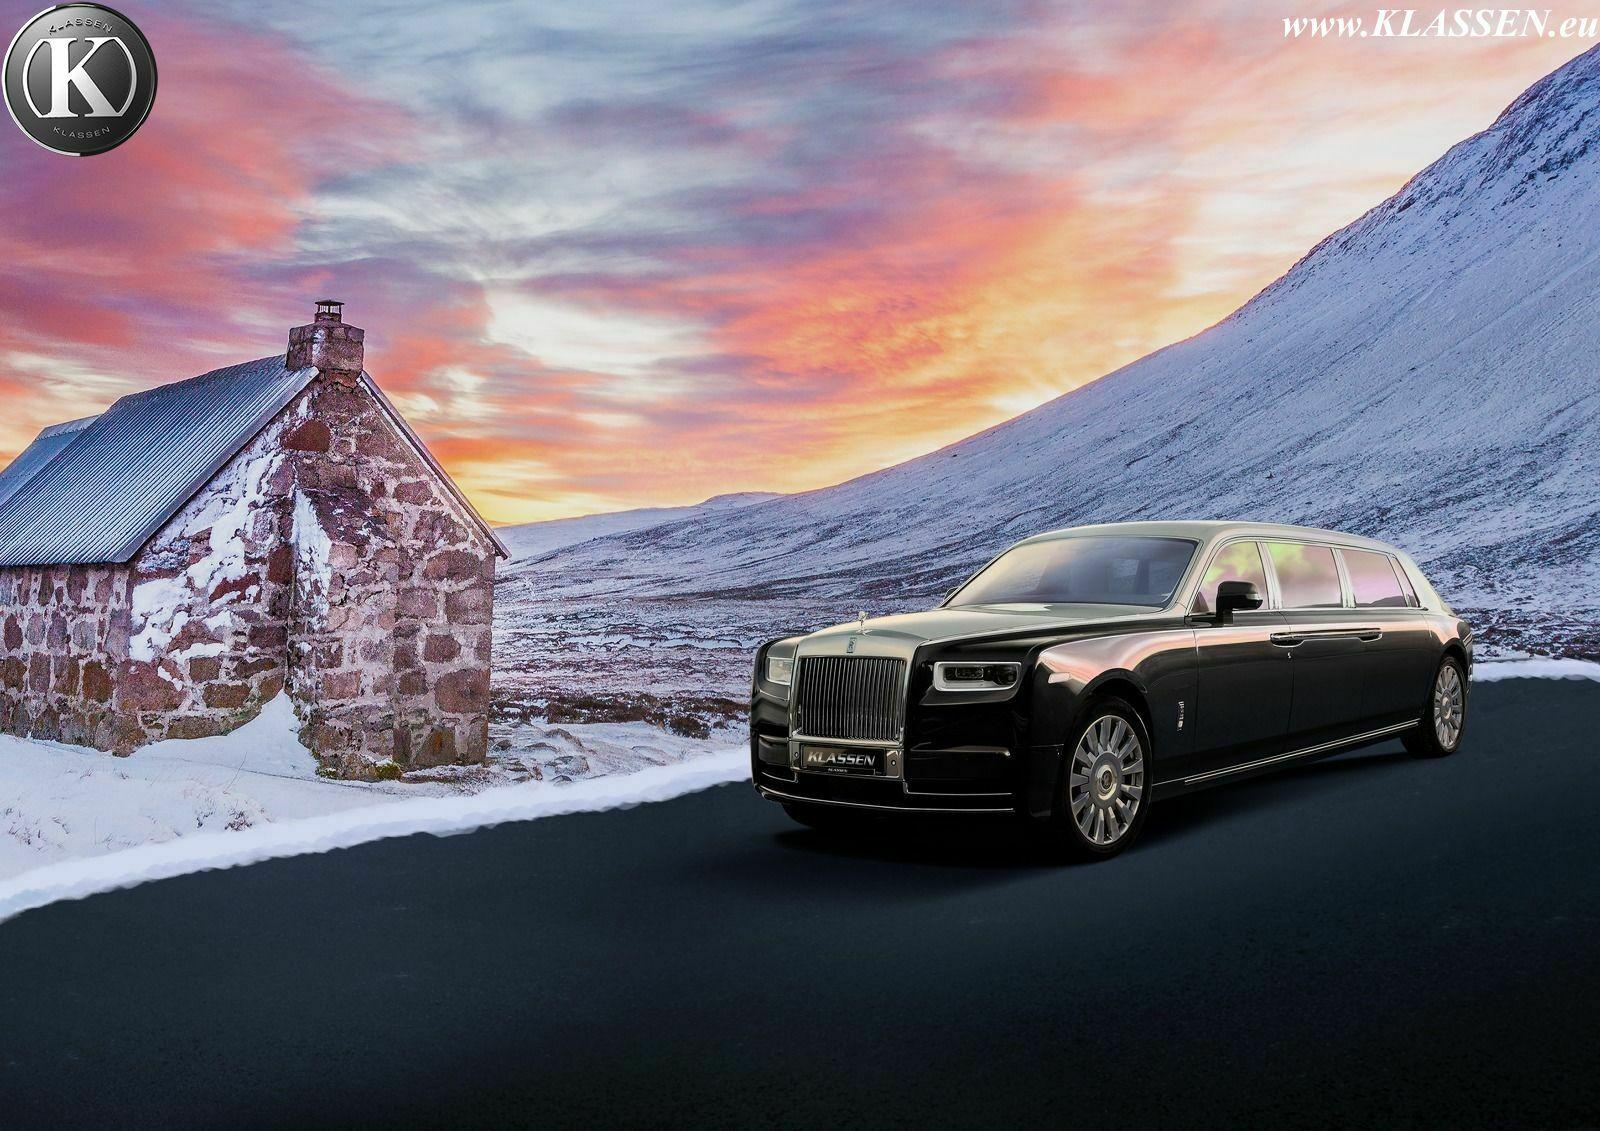 Rolls-Royce-Phantom-by-Klassen-1